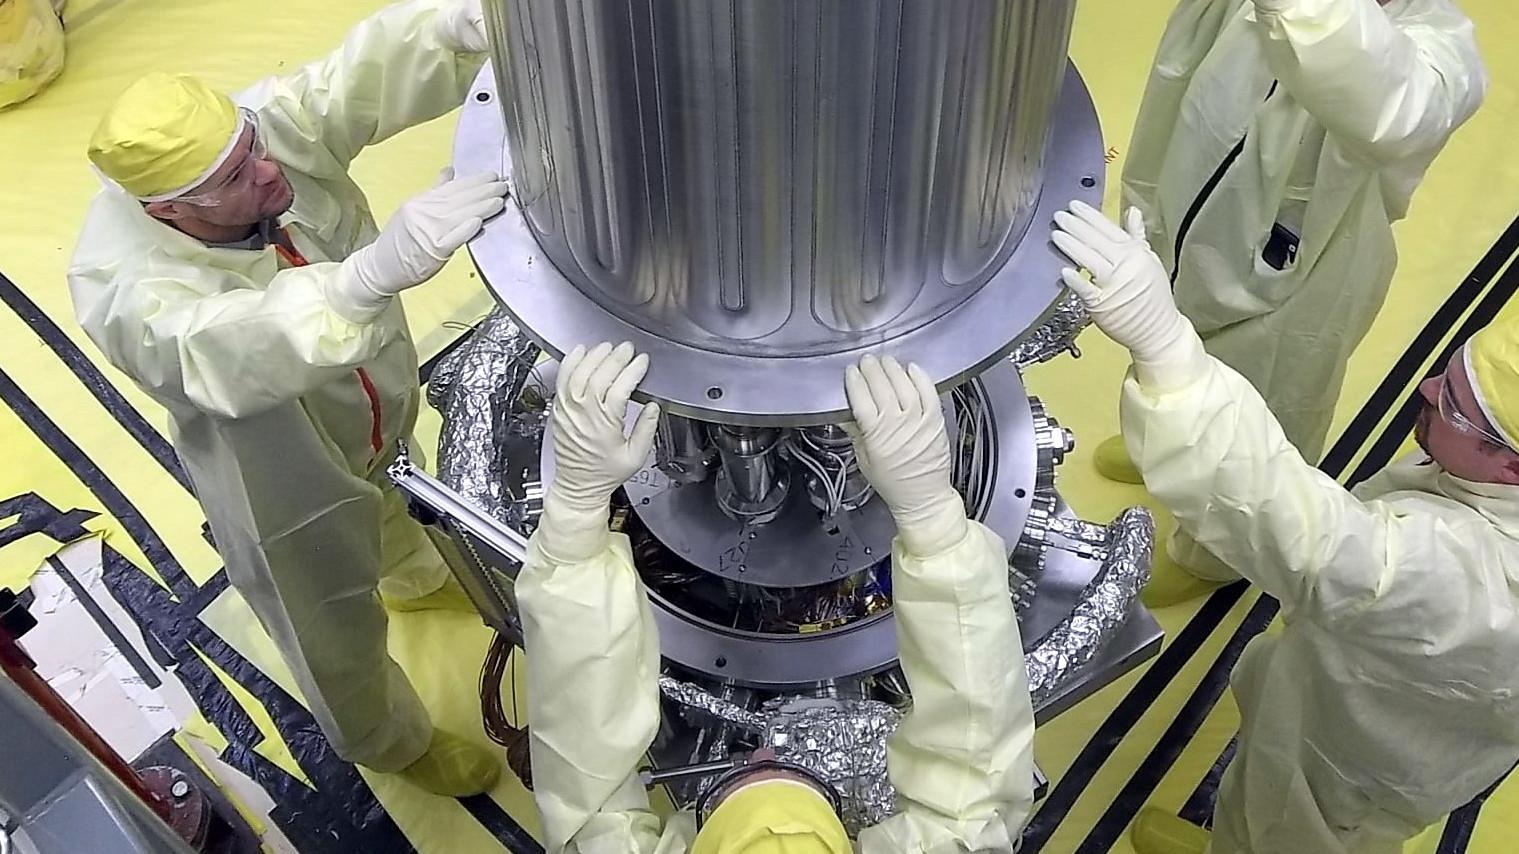 krusty-nasa-nuclear-reactor-space-orbit-moon-mars-habitat-explore.jpg?quality=75&strip=all&w=1100&h=618